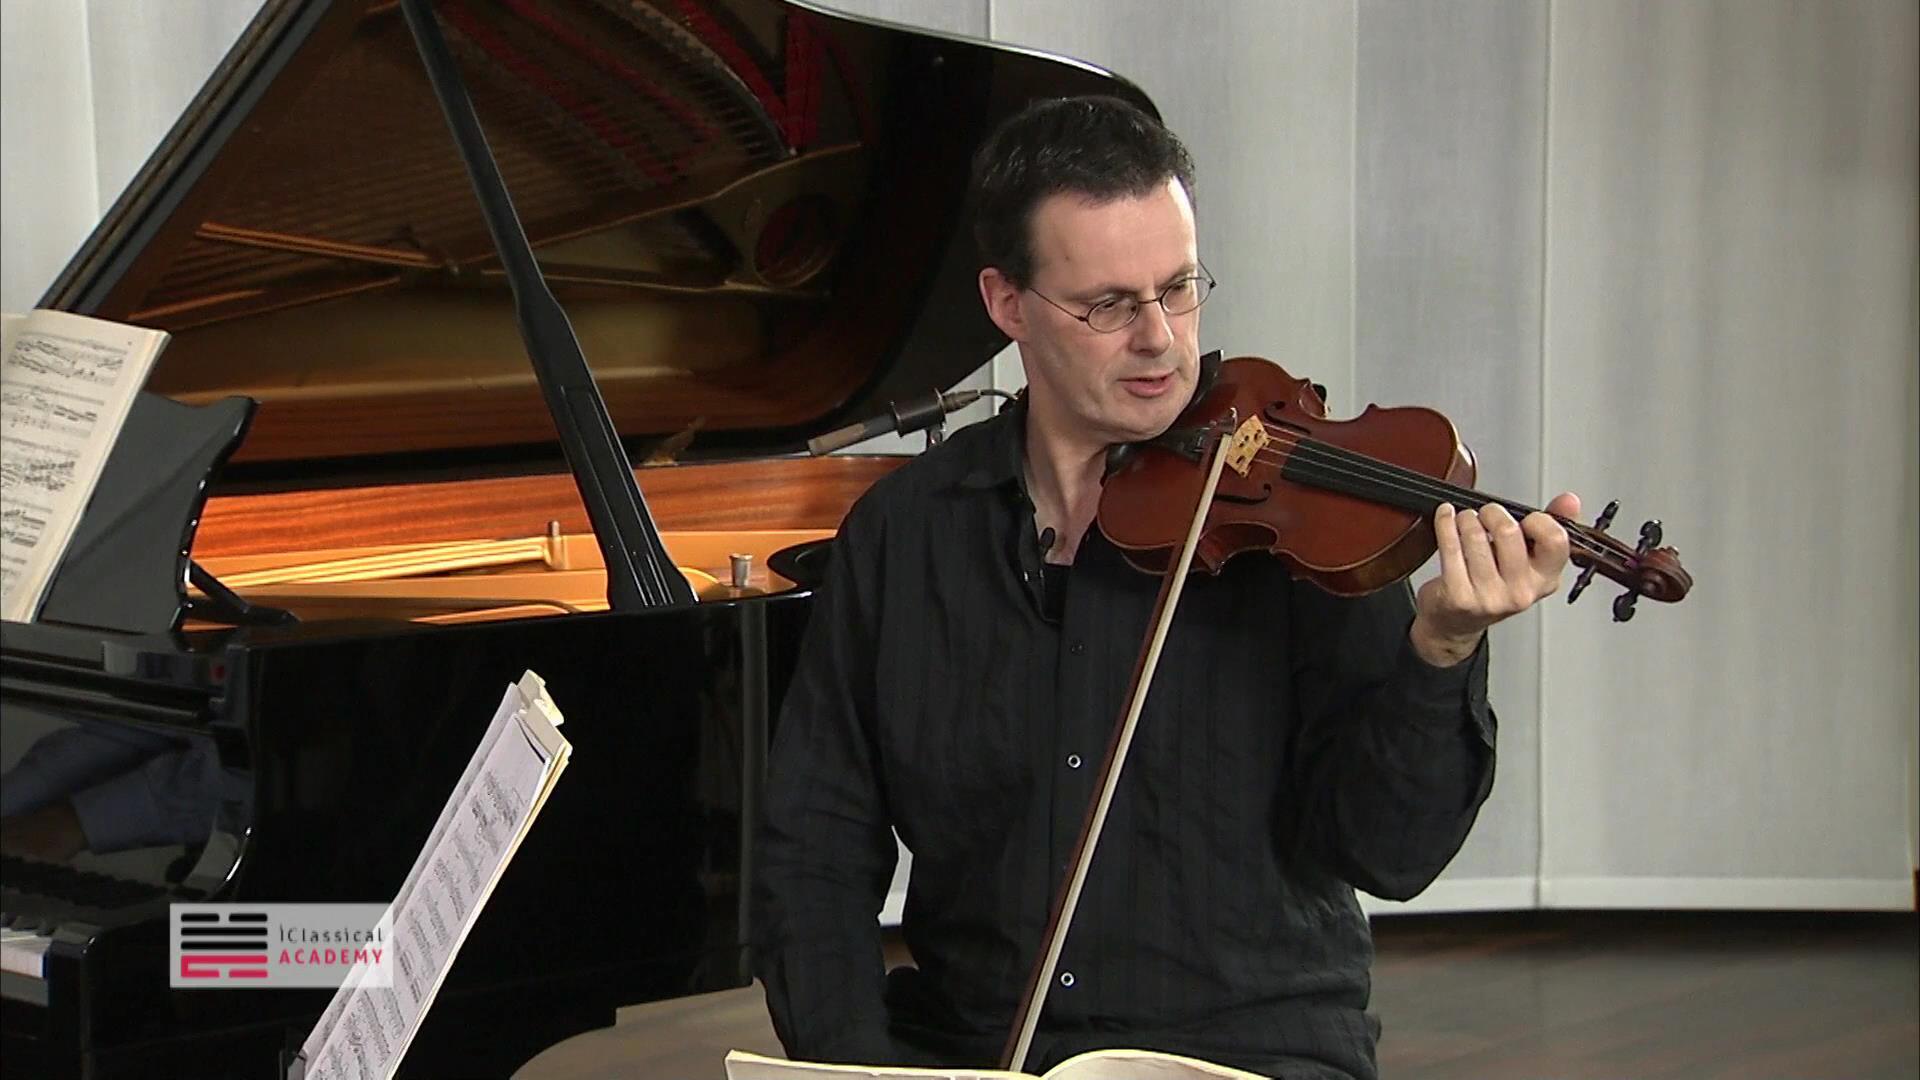 Piano, Violin & Cello Teacher Online - iClassical Academy